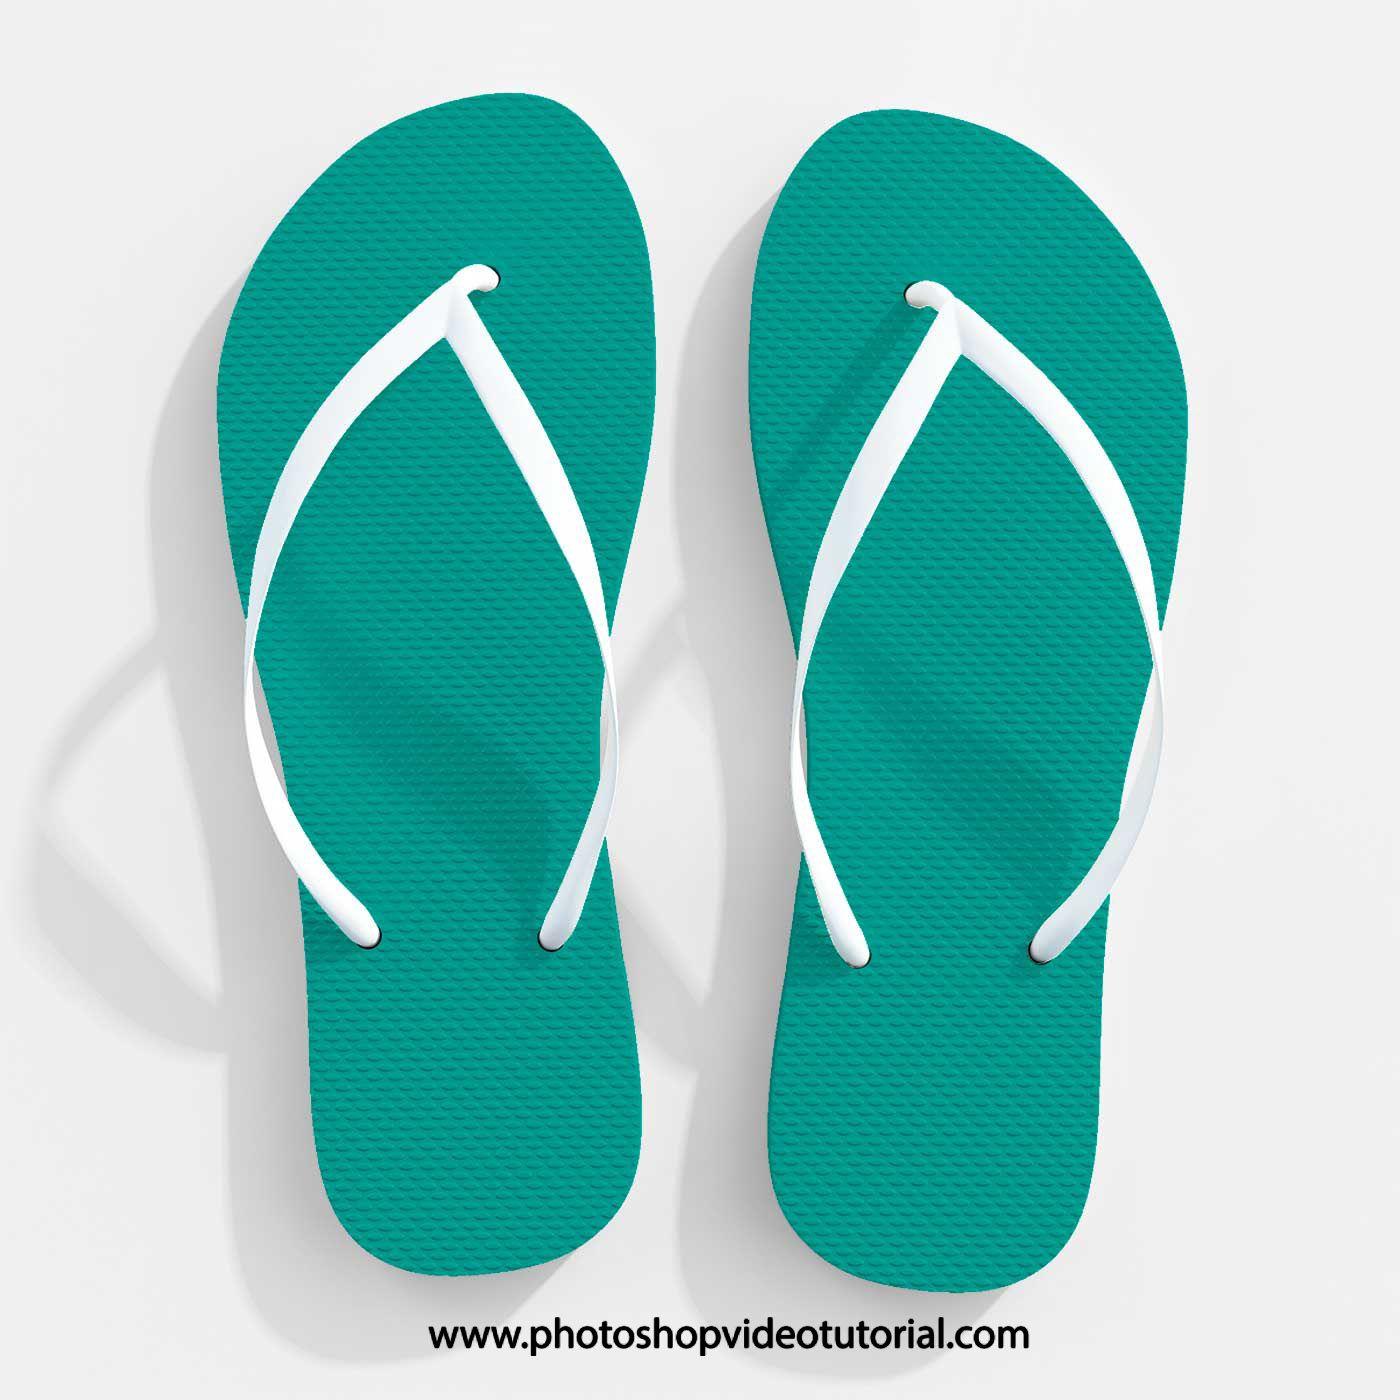 Flip Flop Slipper Psd Mockup For Designing Casual Footwear Easily Mockup Free Download Mockup Free Psd Free Logo Mockup